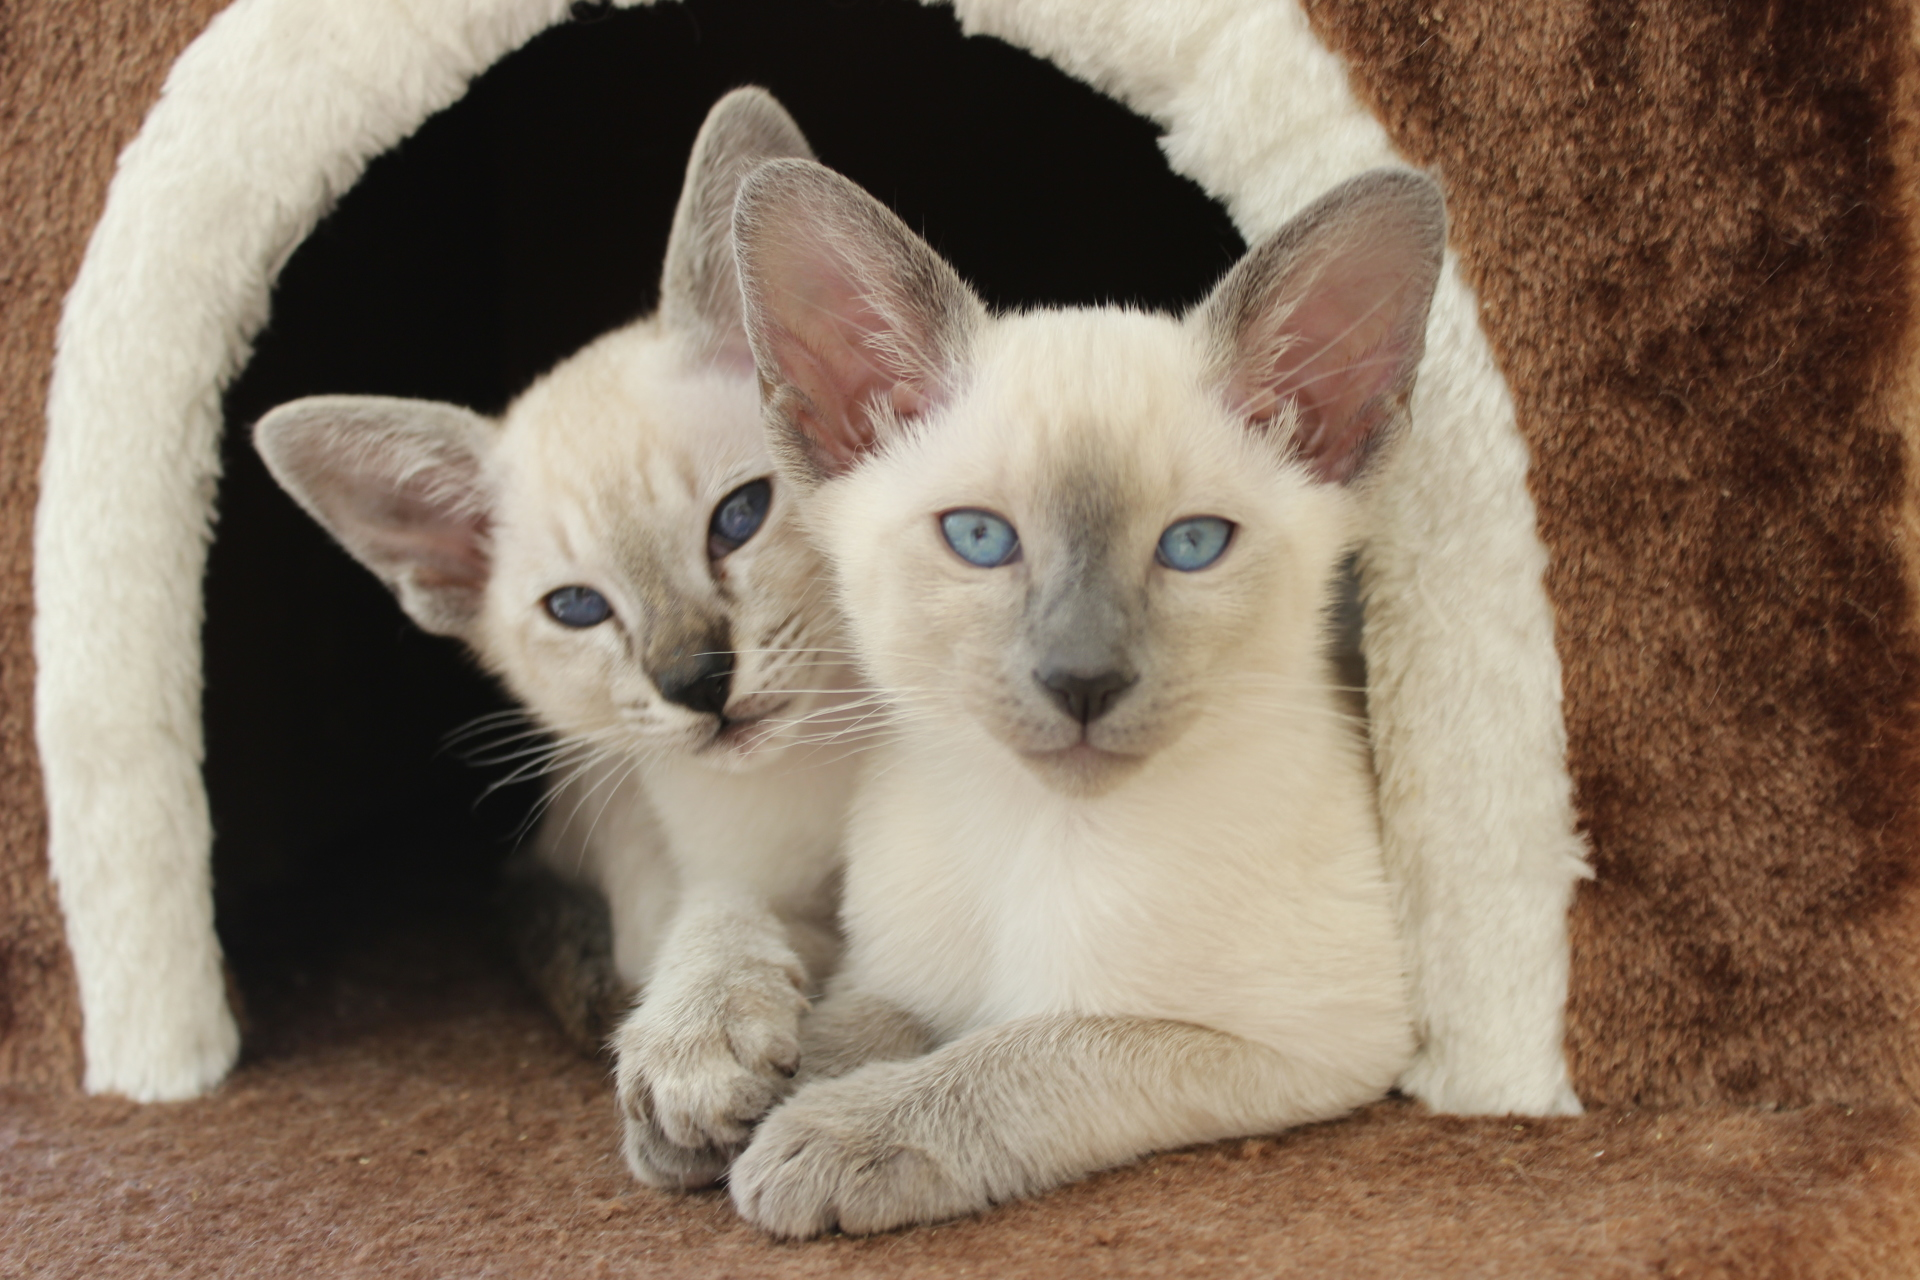 Blue & Choc tabby